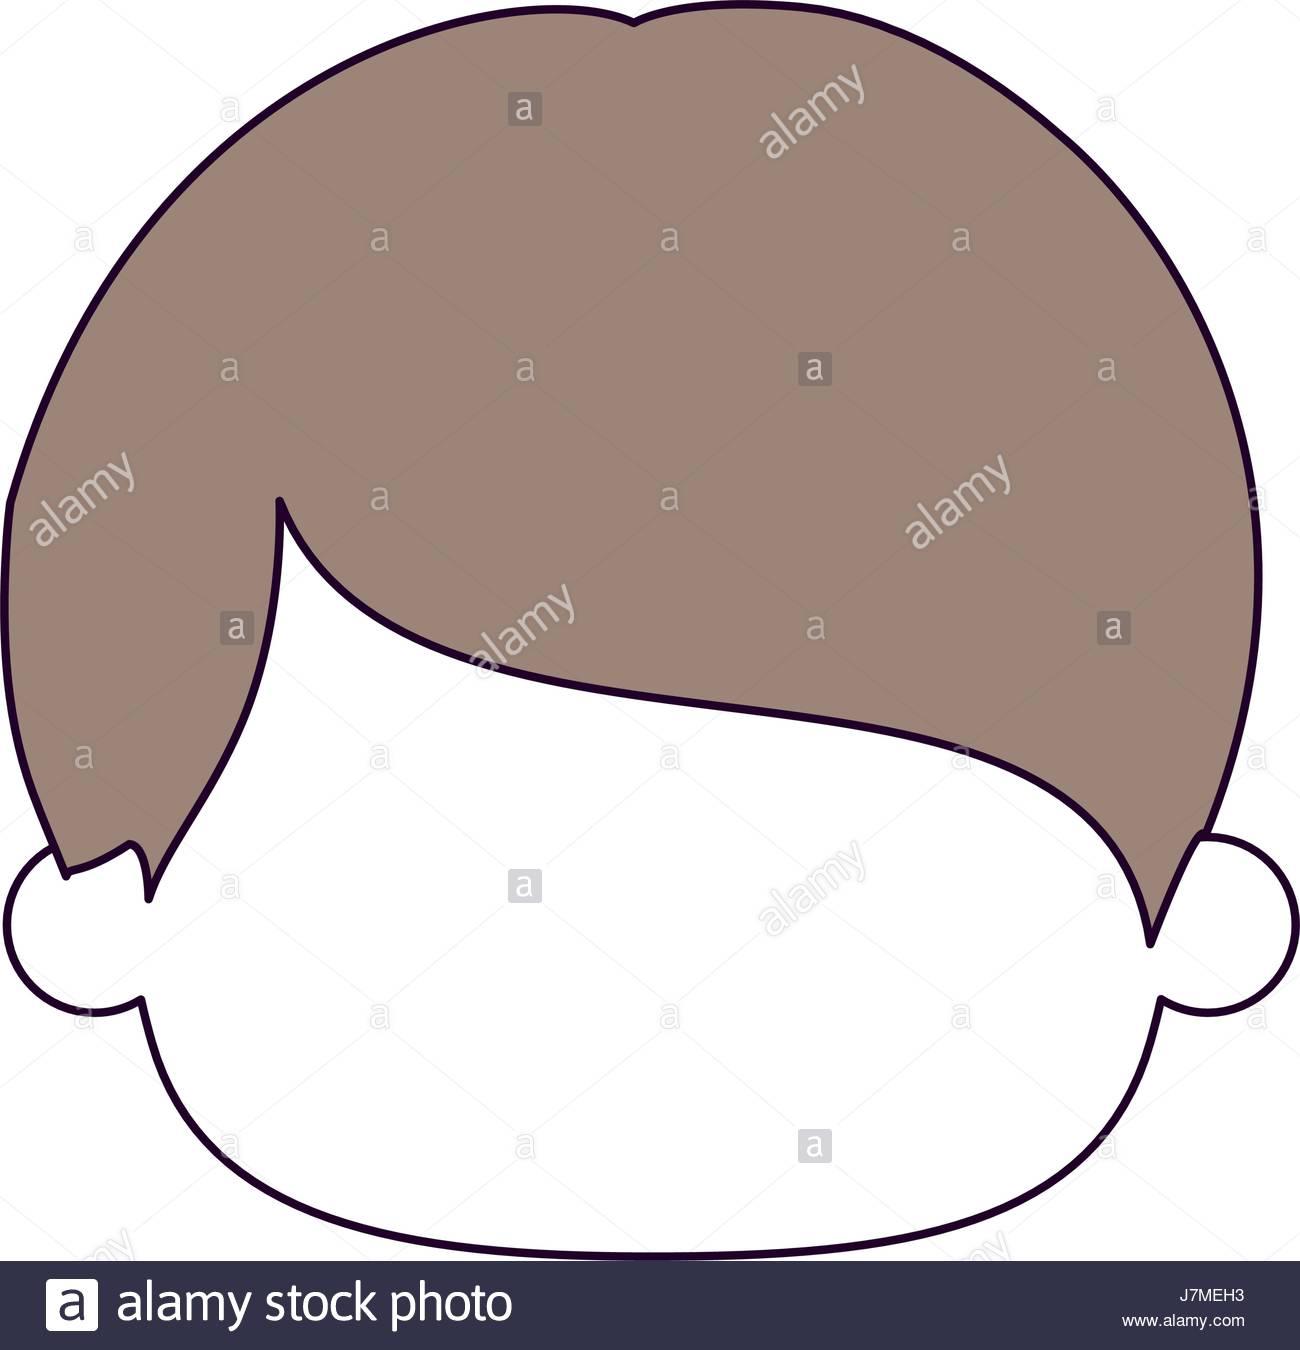 Boy Head Hair Clip Art Stock Photos & Boy Head Hair Clip Art Stock.